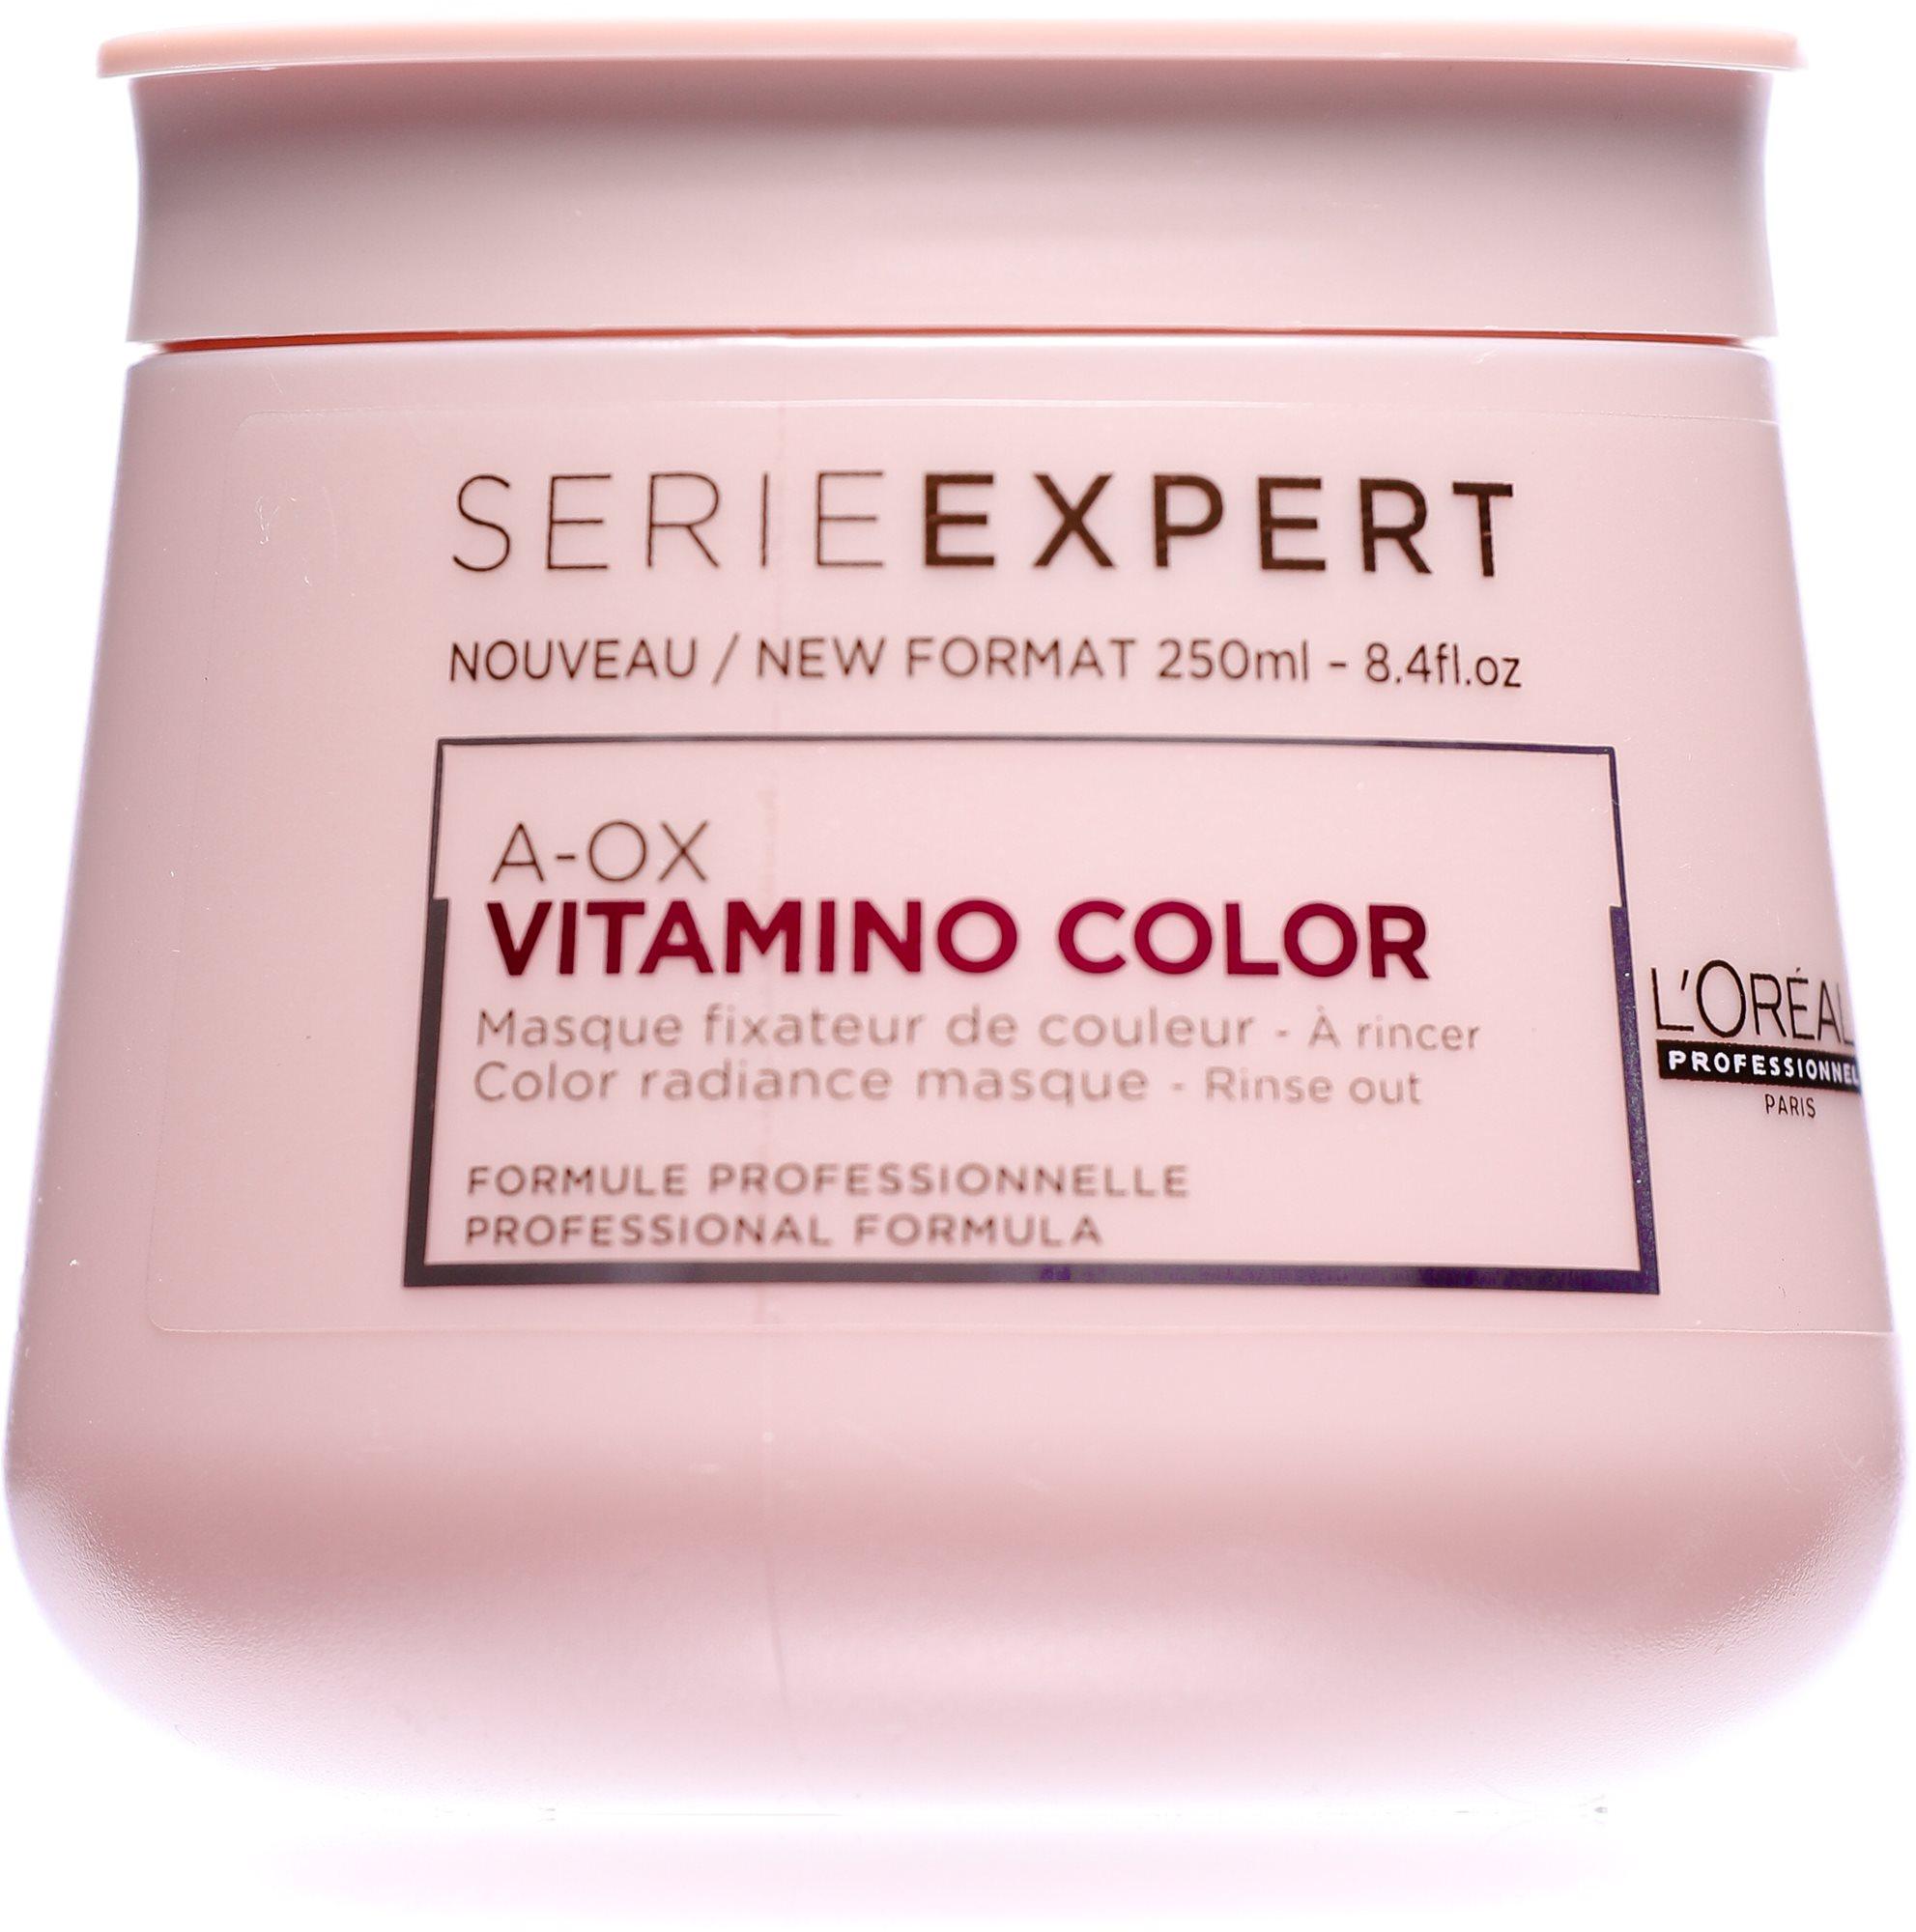 ĽORÉAL PROFESSIONNEL Serie Expert  A-Ox Vitamino Color Masque hajpakolás 250 ml